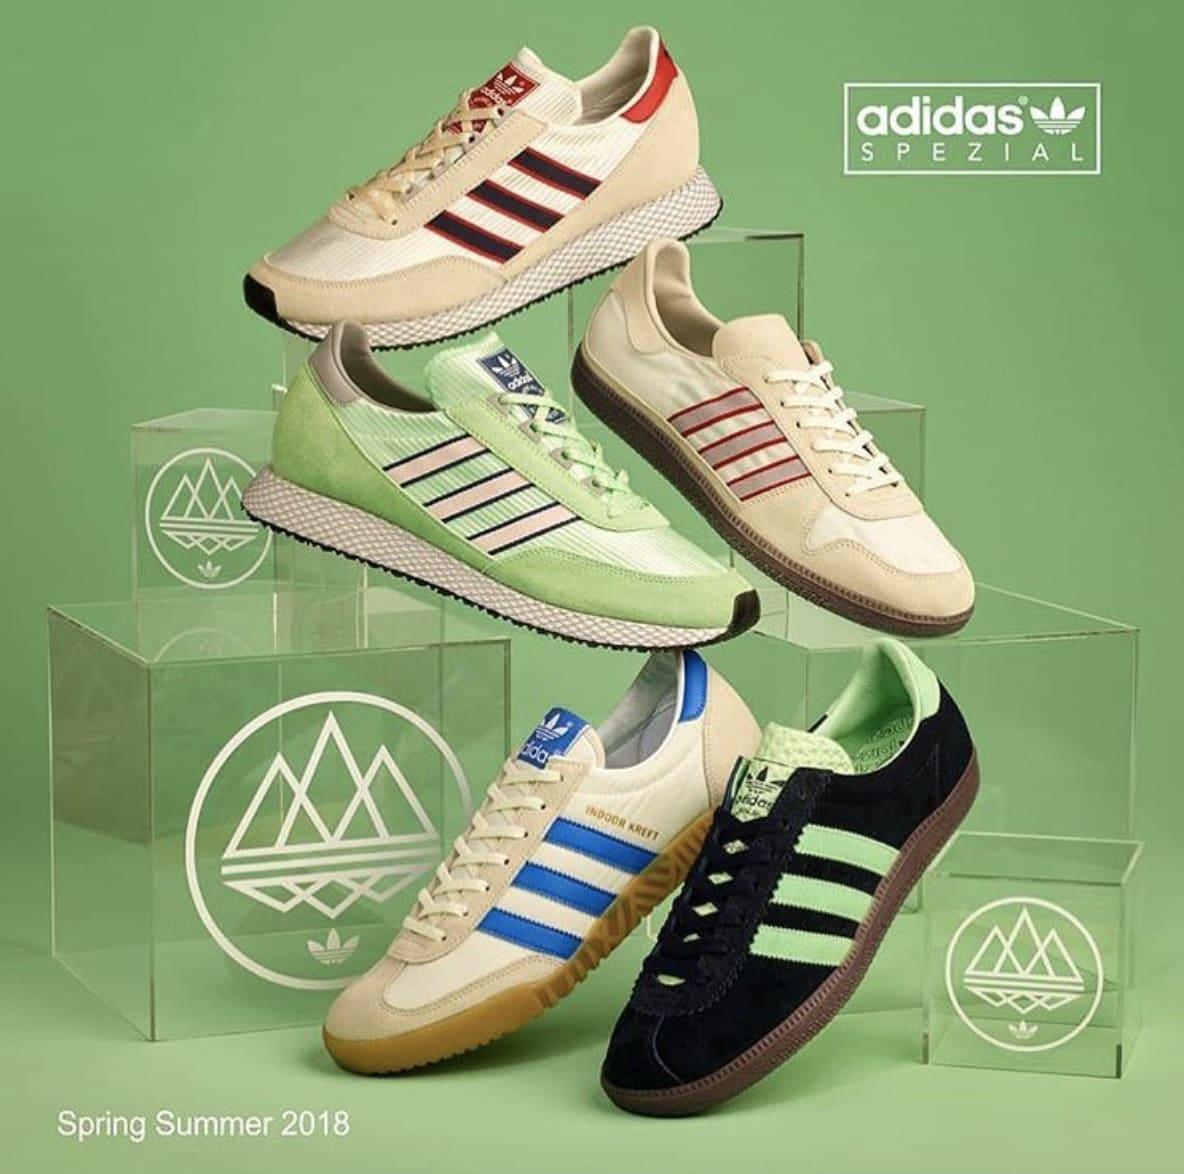 Adidas Spezial Spring/Summer 2018 First Drop